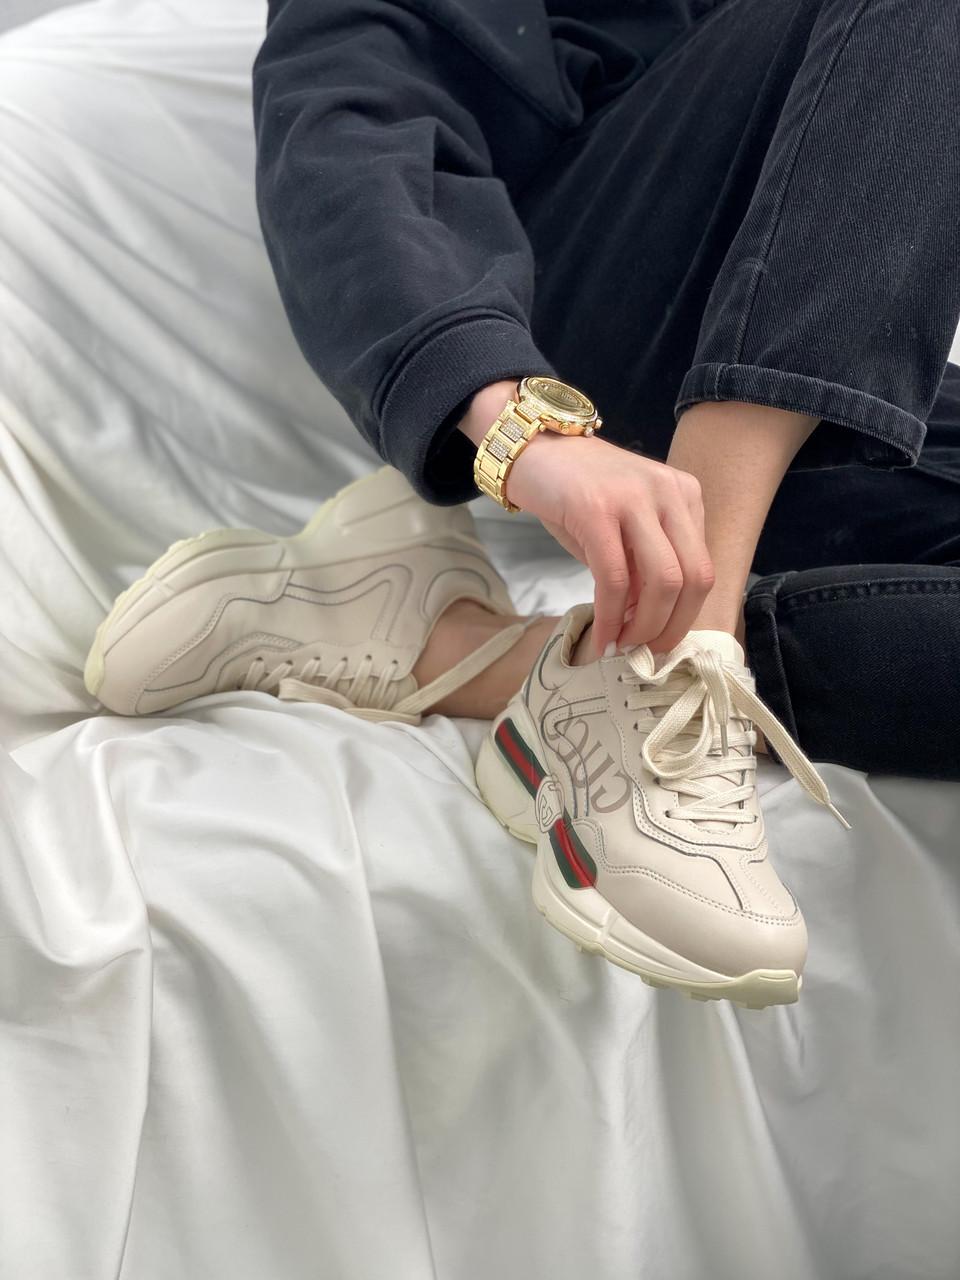 Кроссовки Gucci Rhyton (белые)